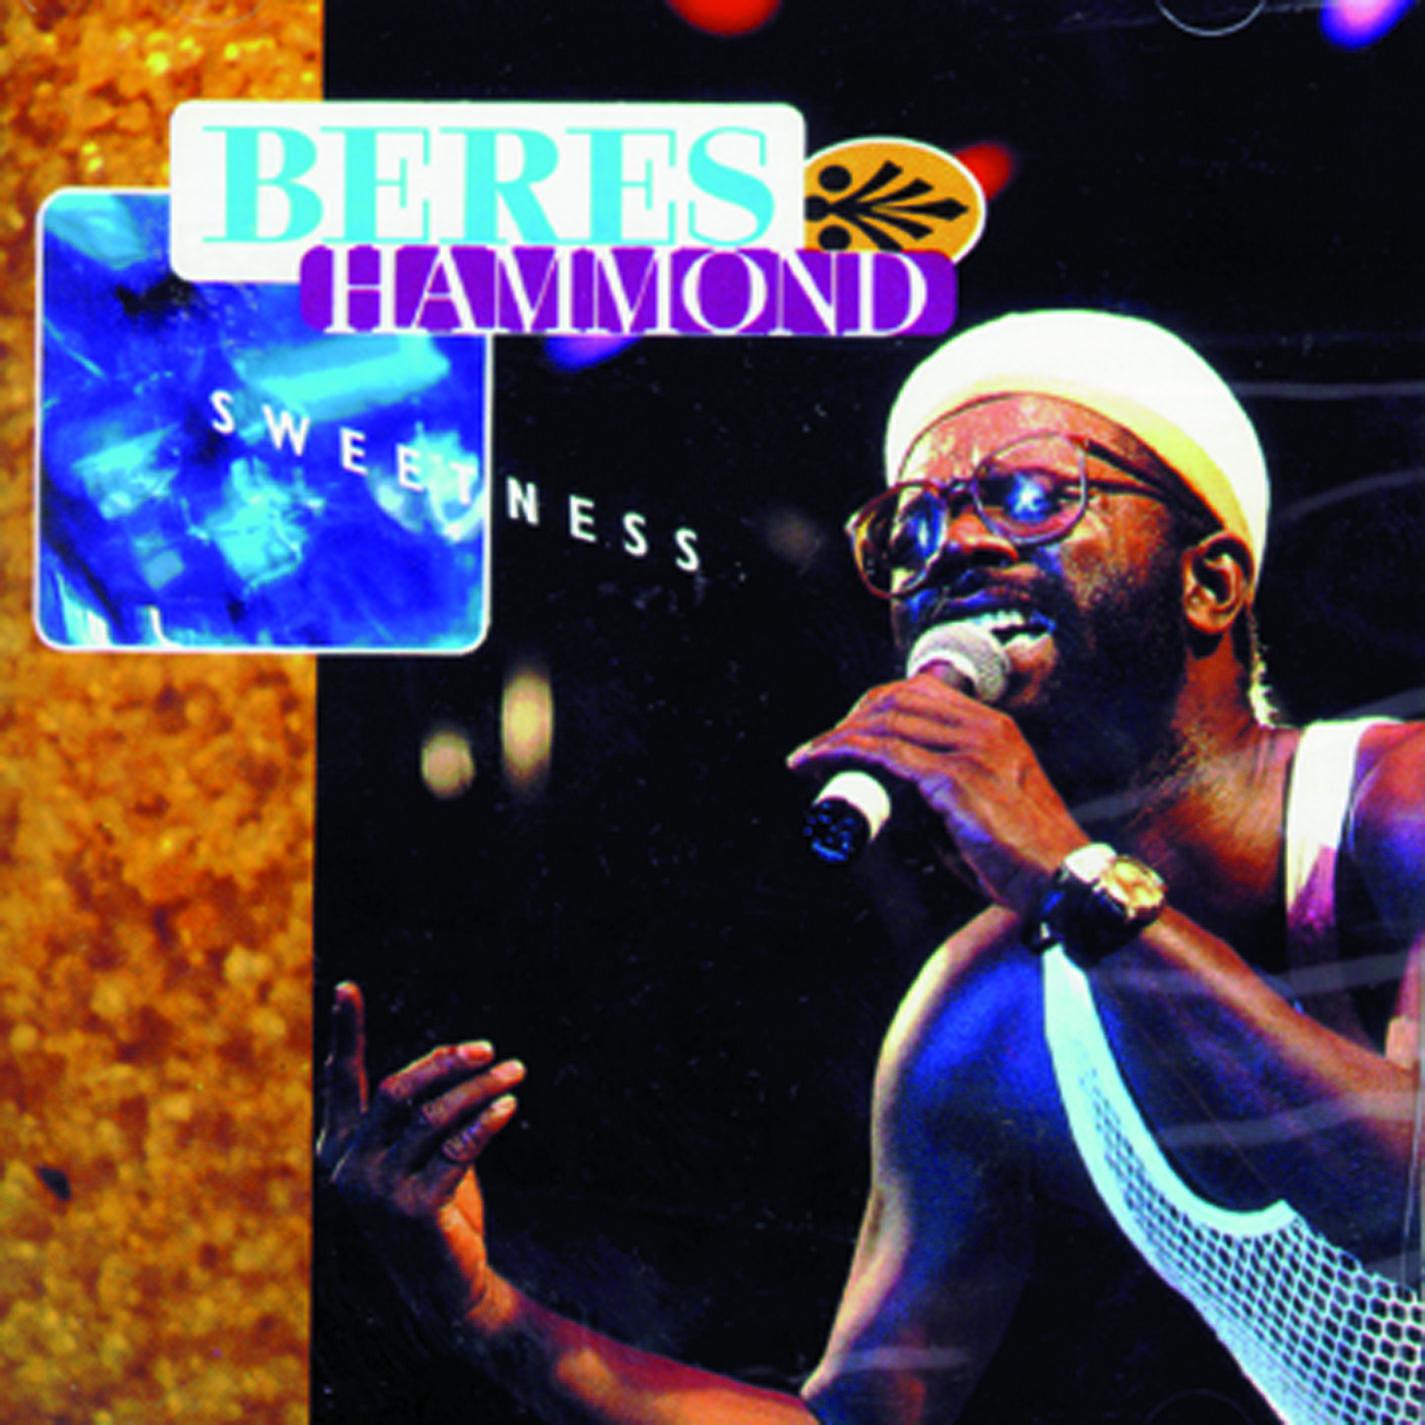 Beres Hammond – Sweetness